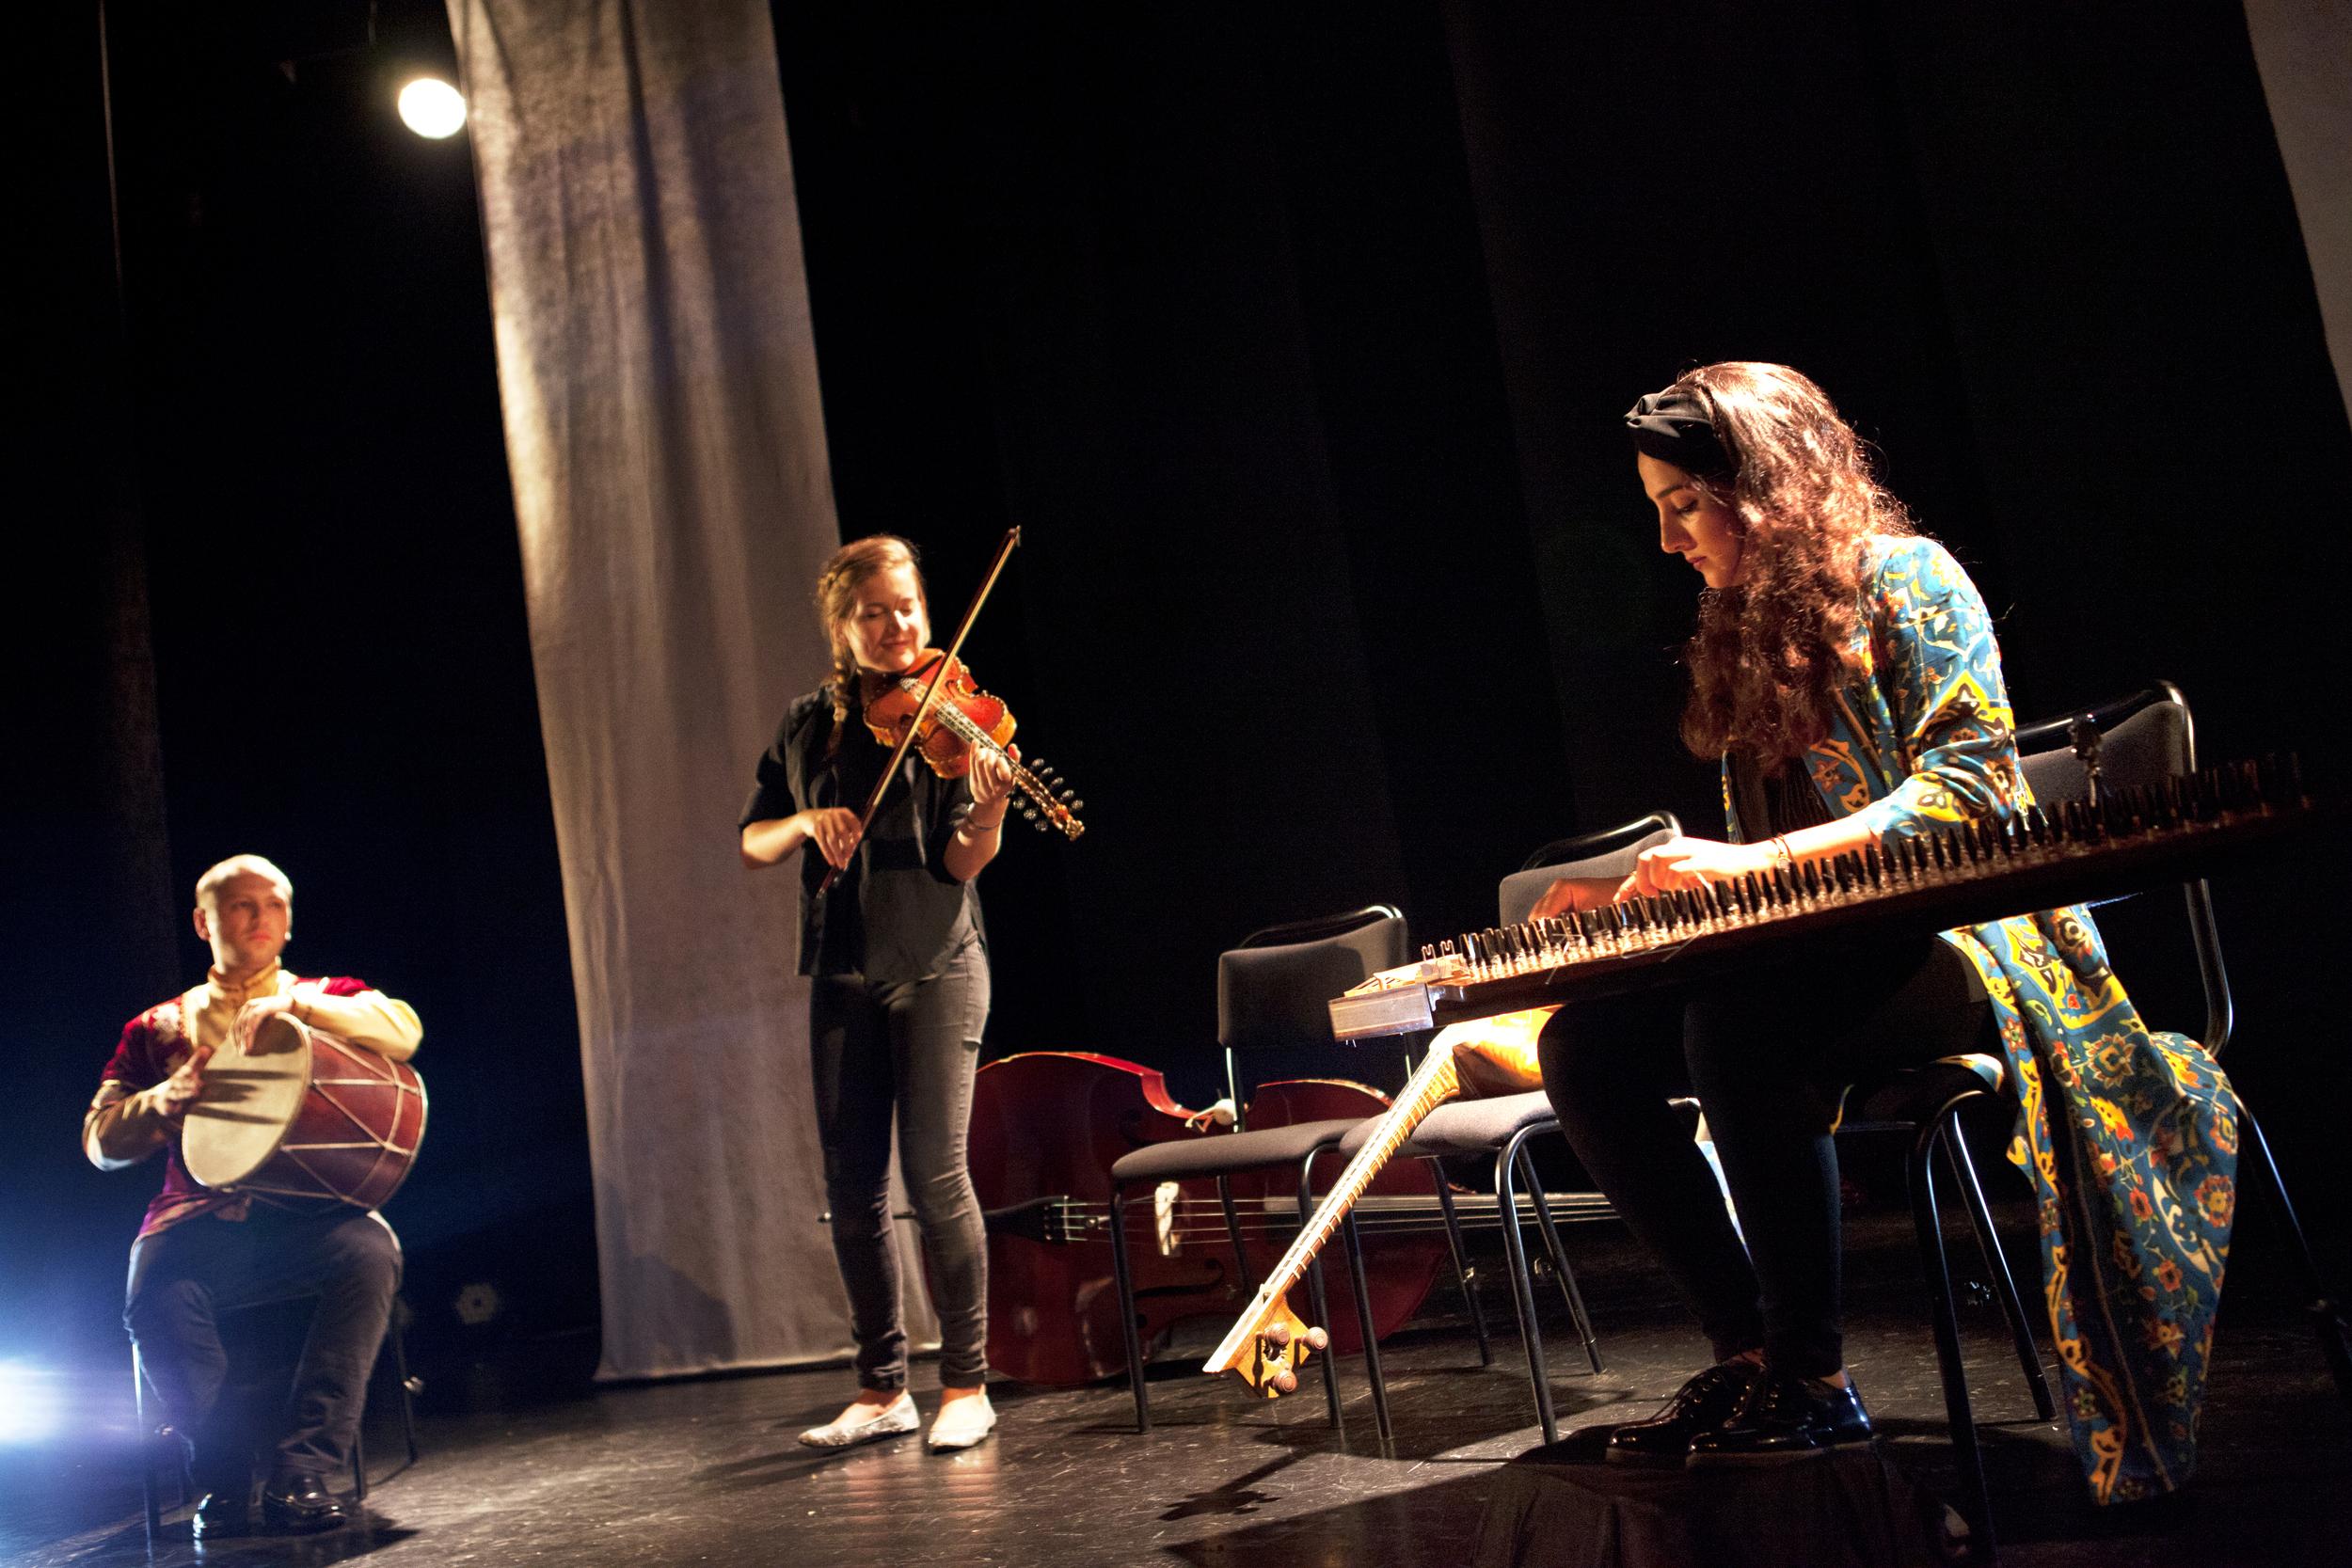 talent - teatersalen - 4. juli - heidi hattestein - IMG_5412.jpg